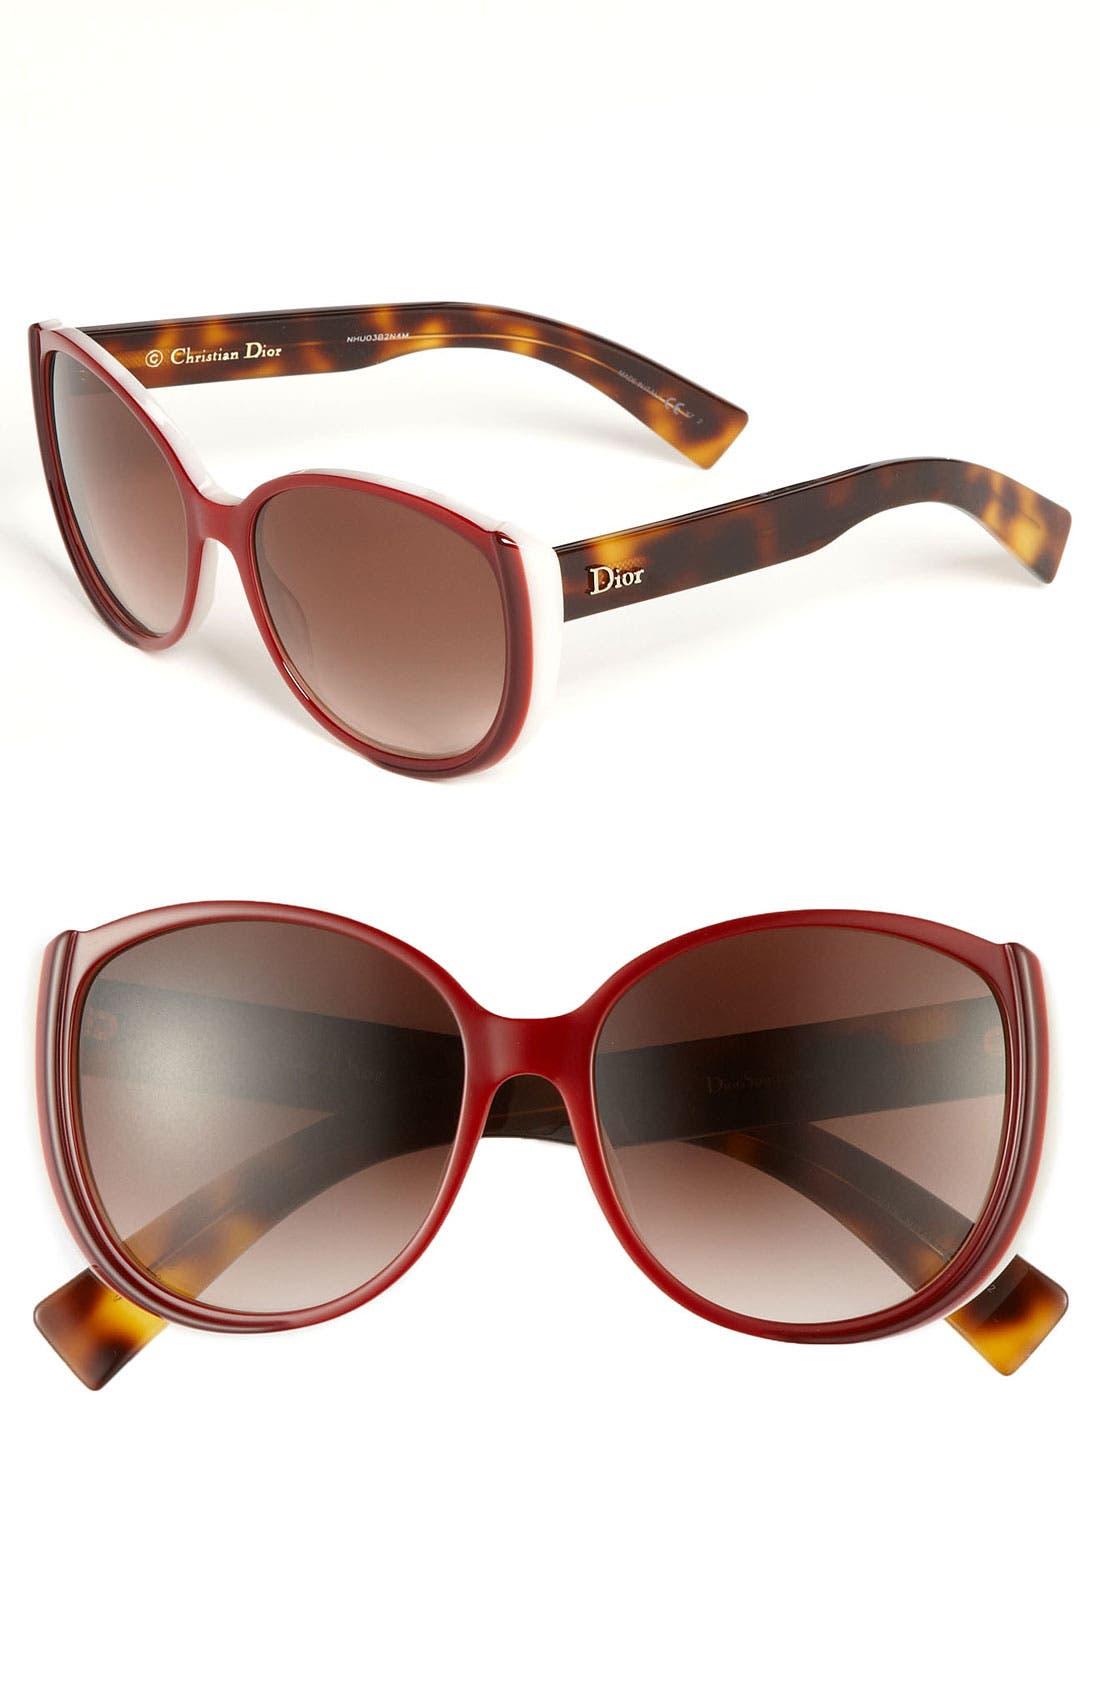 Main Image - Dior 'Summer' 56mm Retro Sunglasses